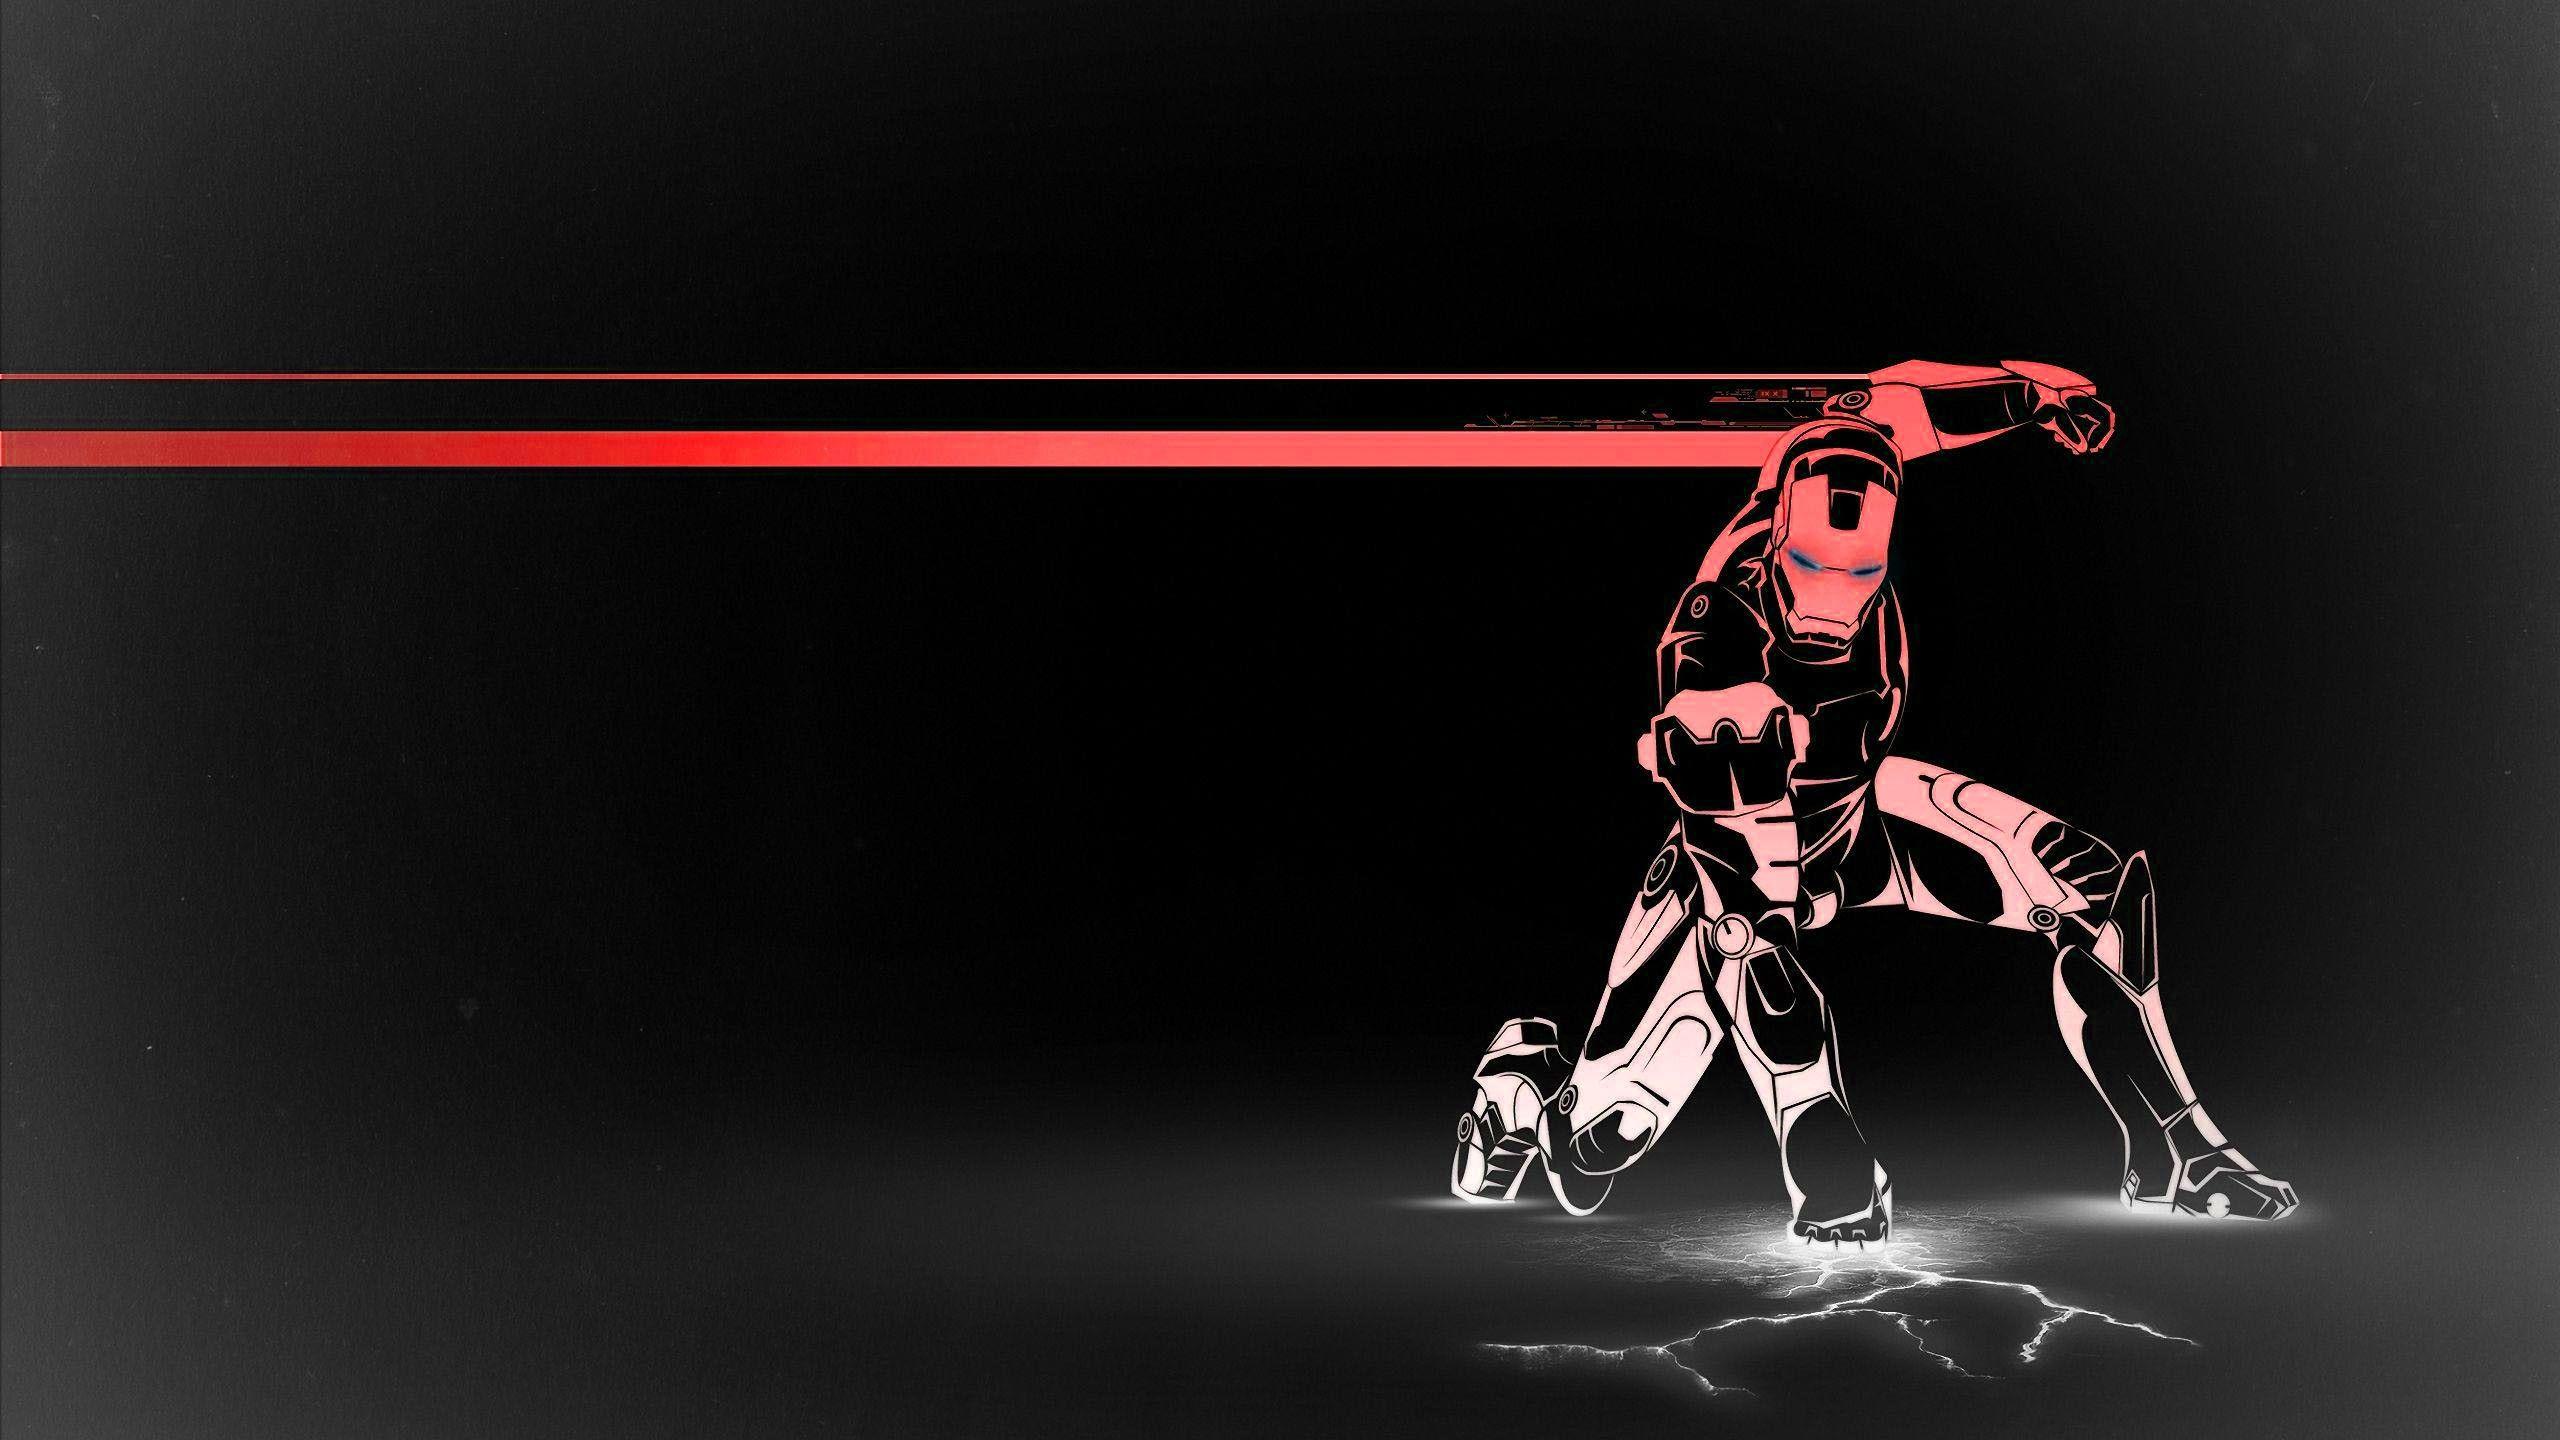 Imagenes De Ironman Para Fondo De Pantalla: Iron Man Wallpaper Background For Free Wallpaper